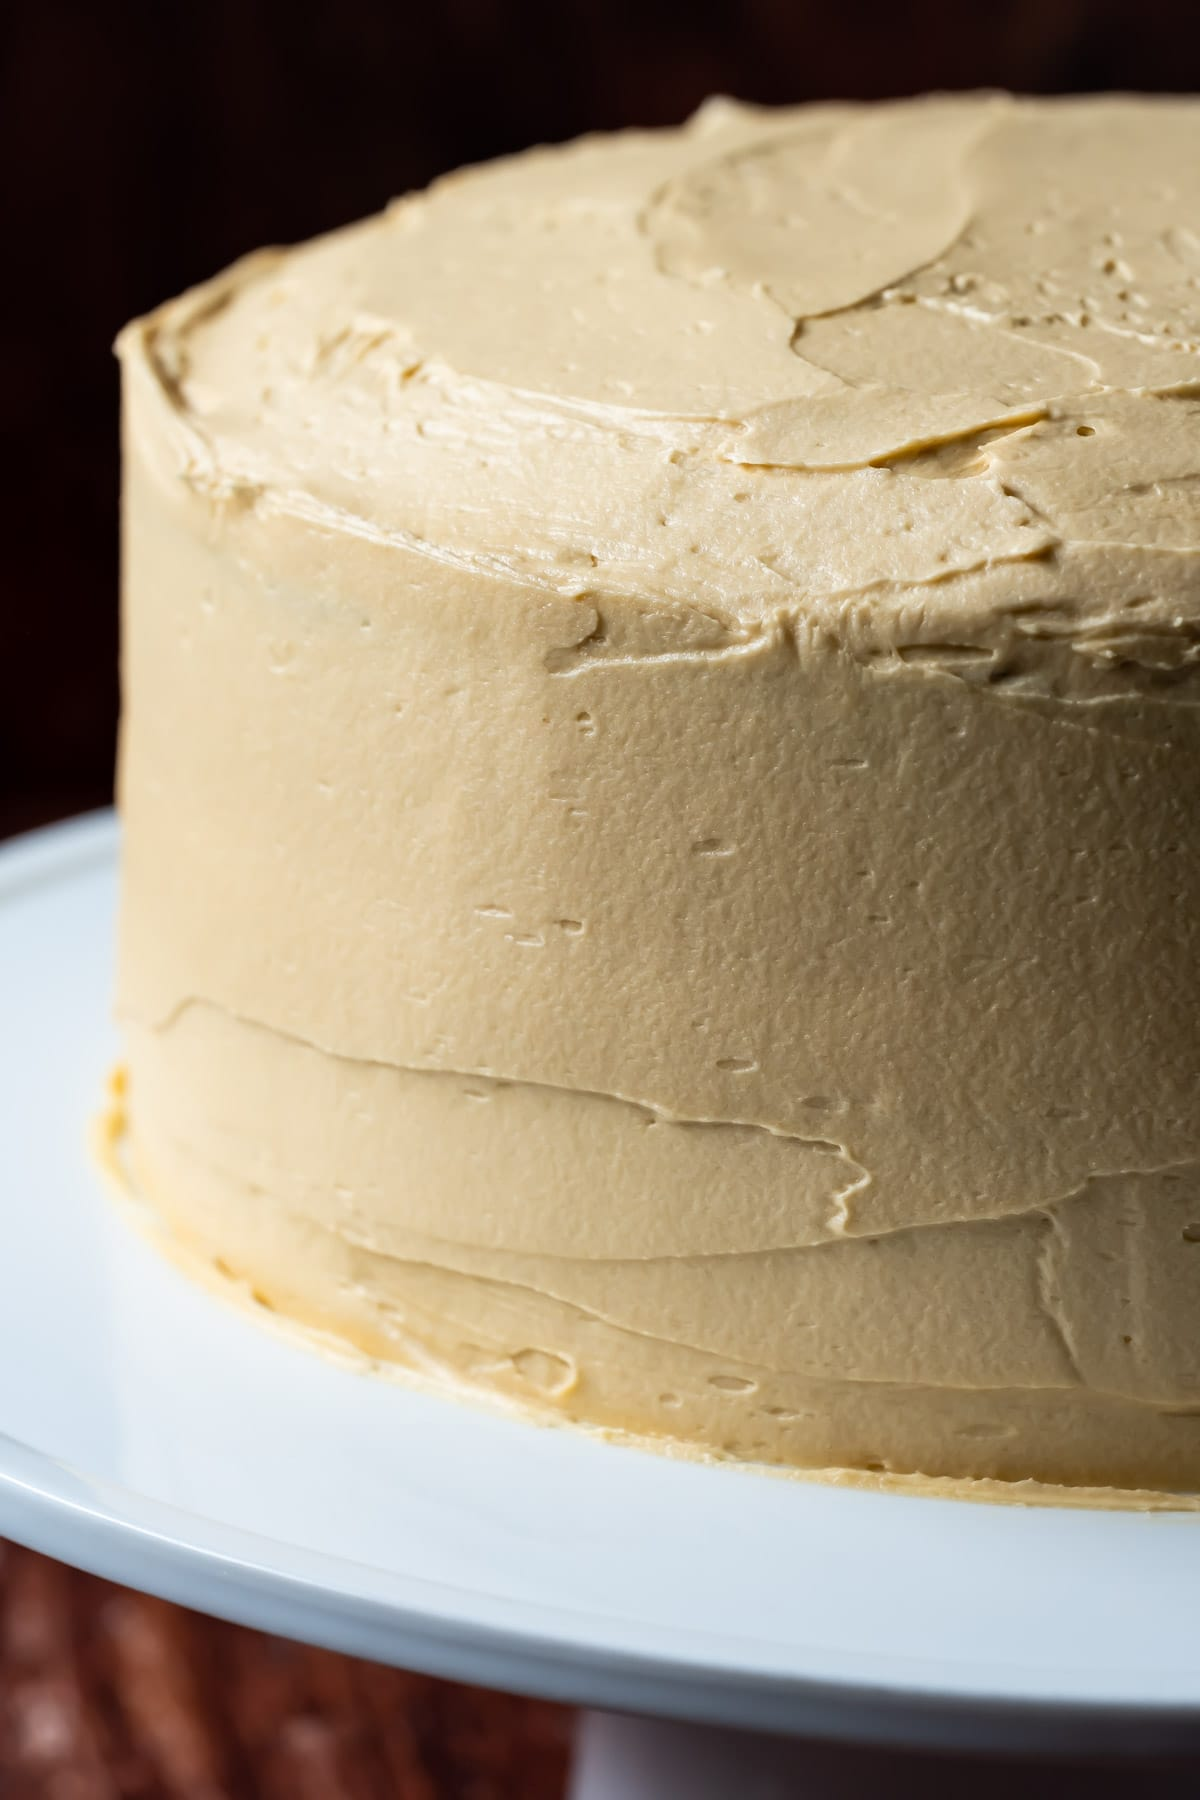 Espresso buttercream frosting spread on a cake.